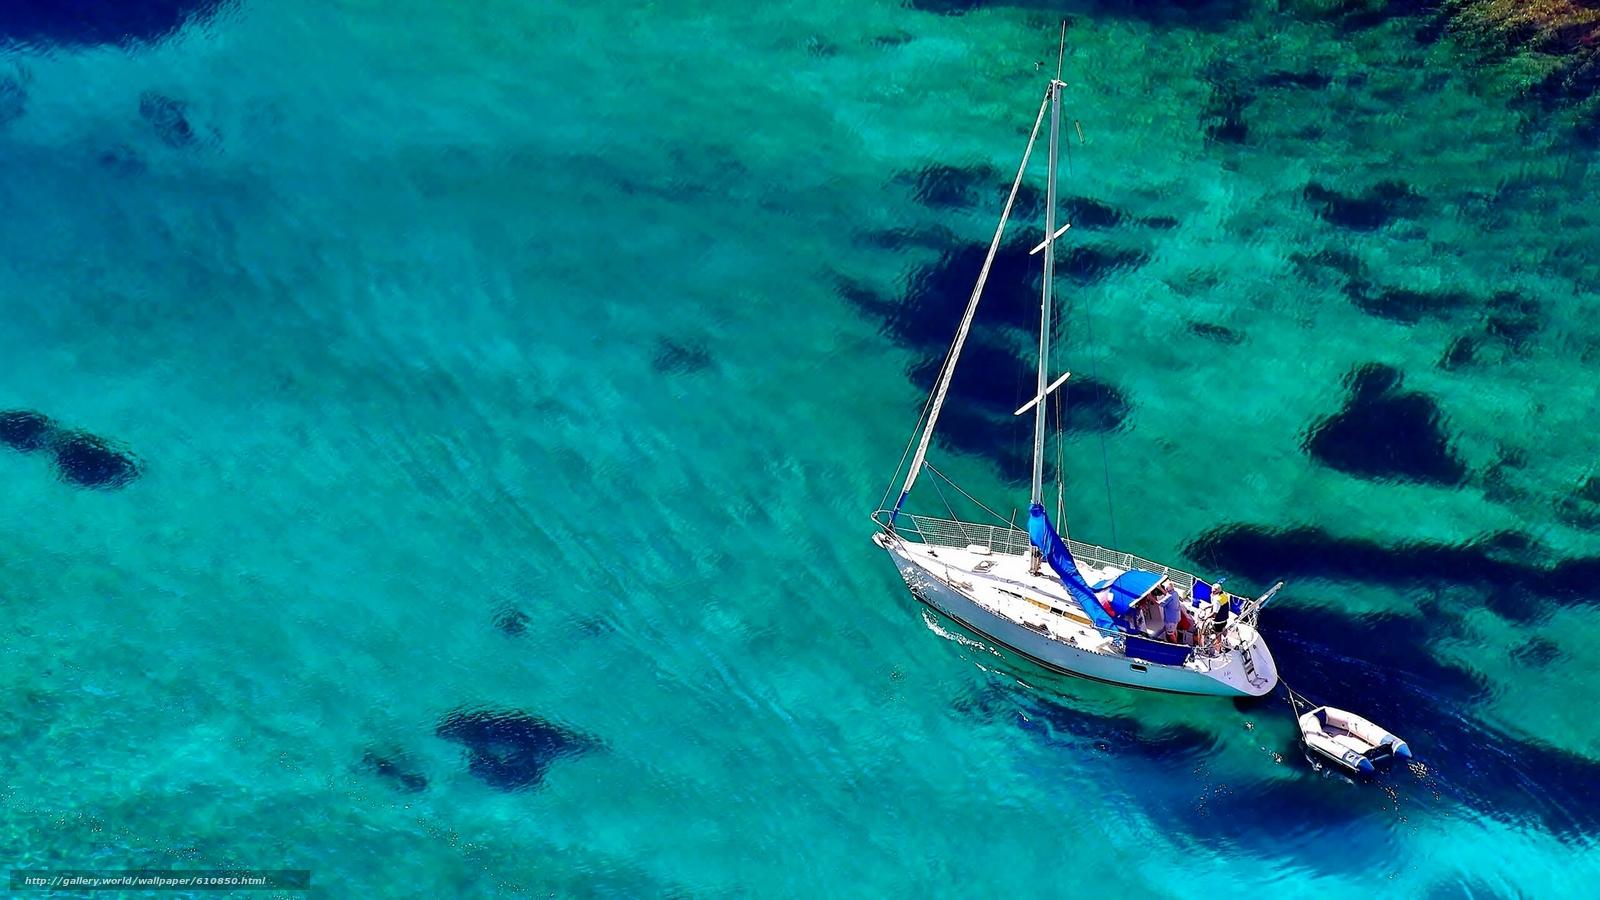 Download wallpaper yacht,  boat,  sea,  water free desktop wallpaper in the resolution 2048x1152 — picture №610850